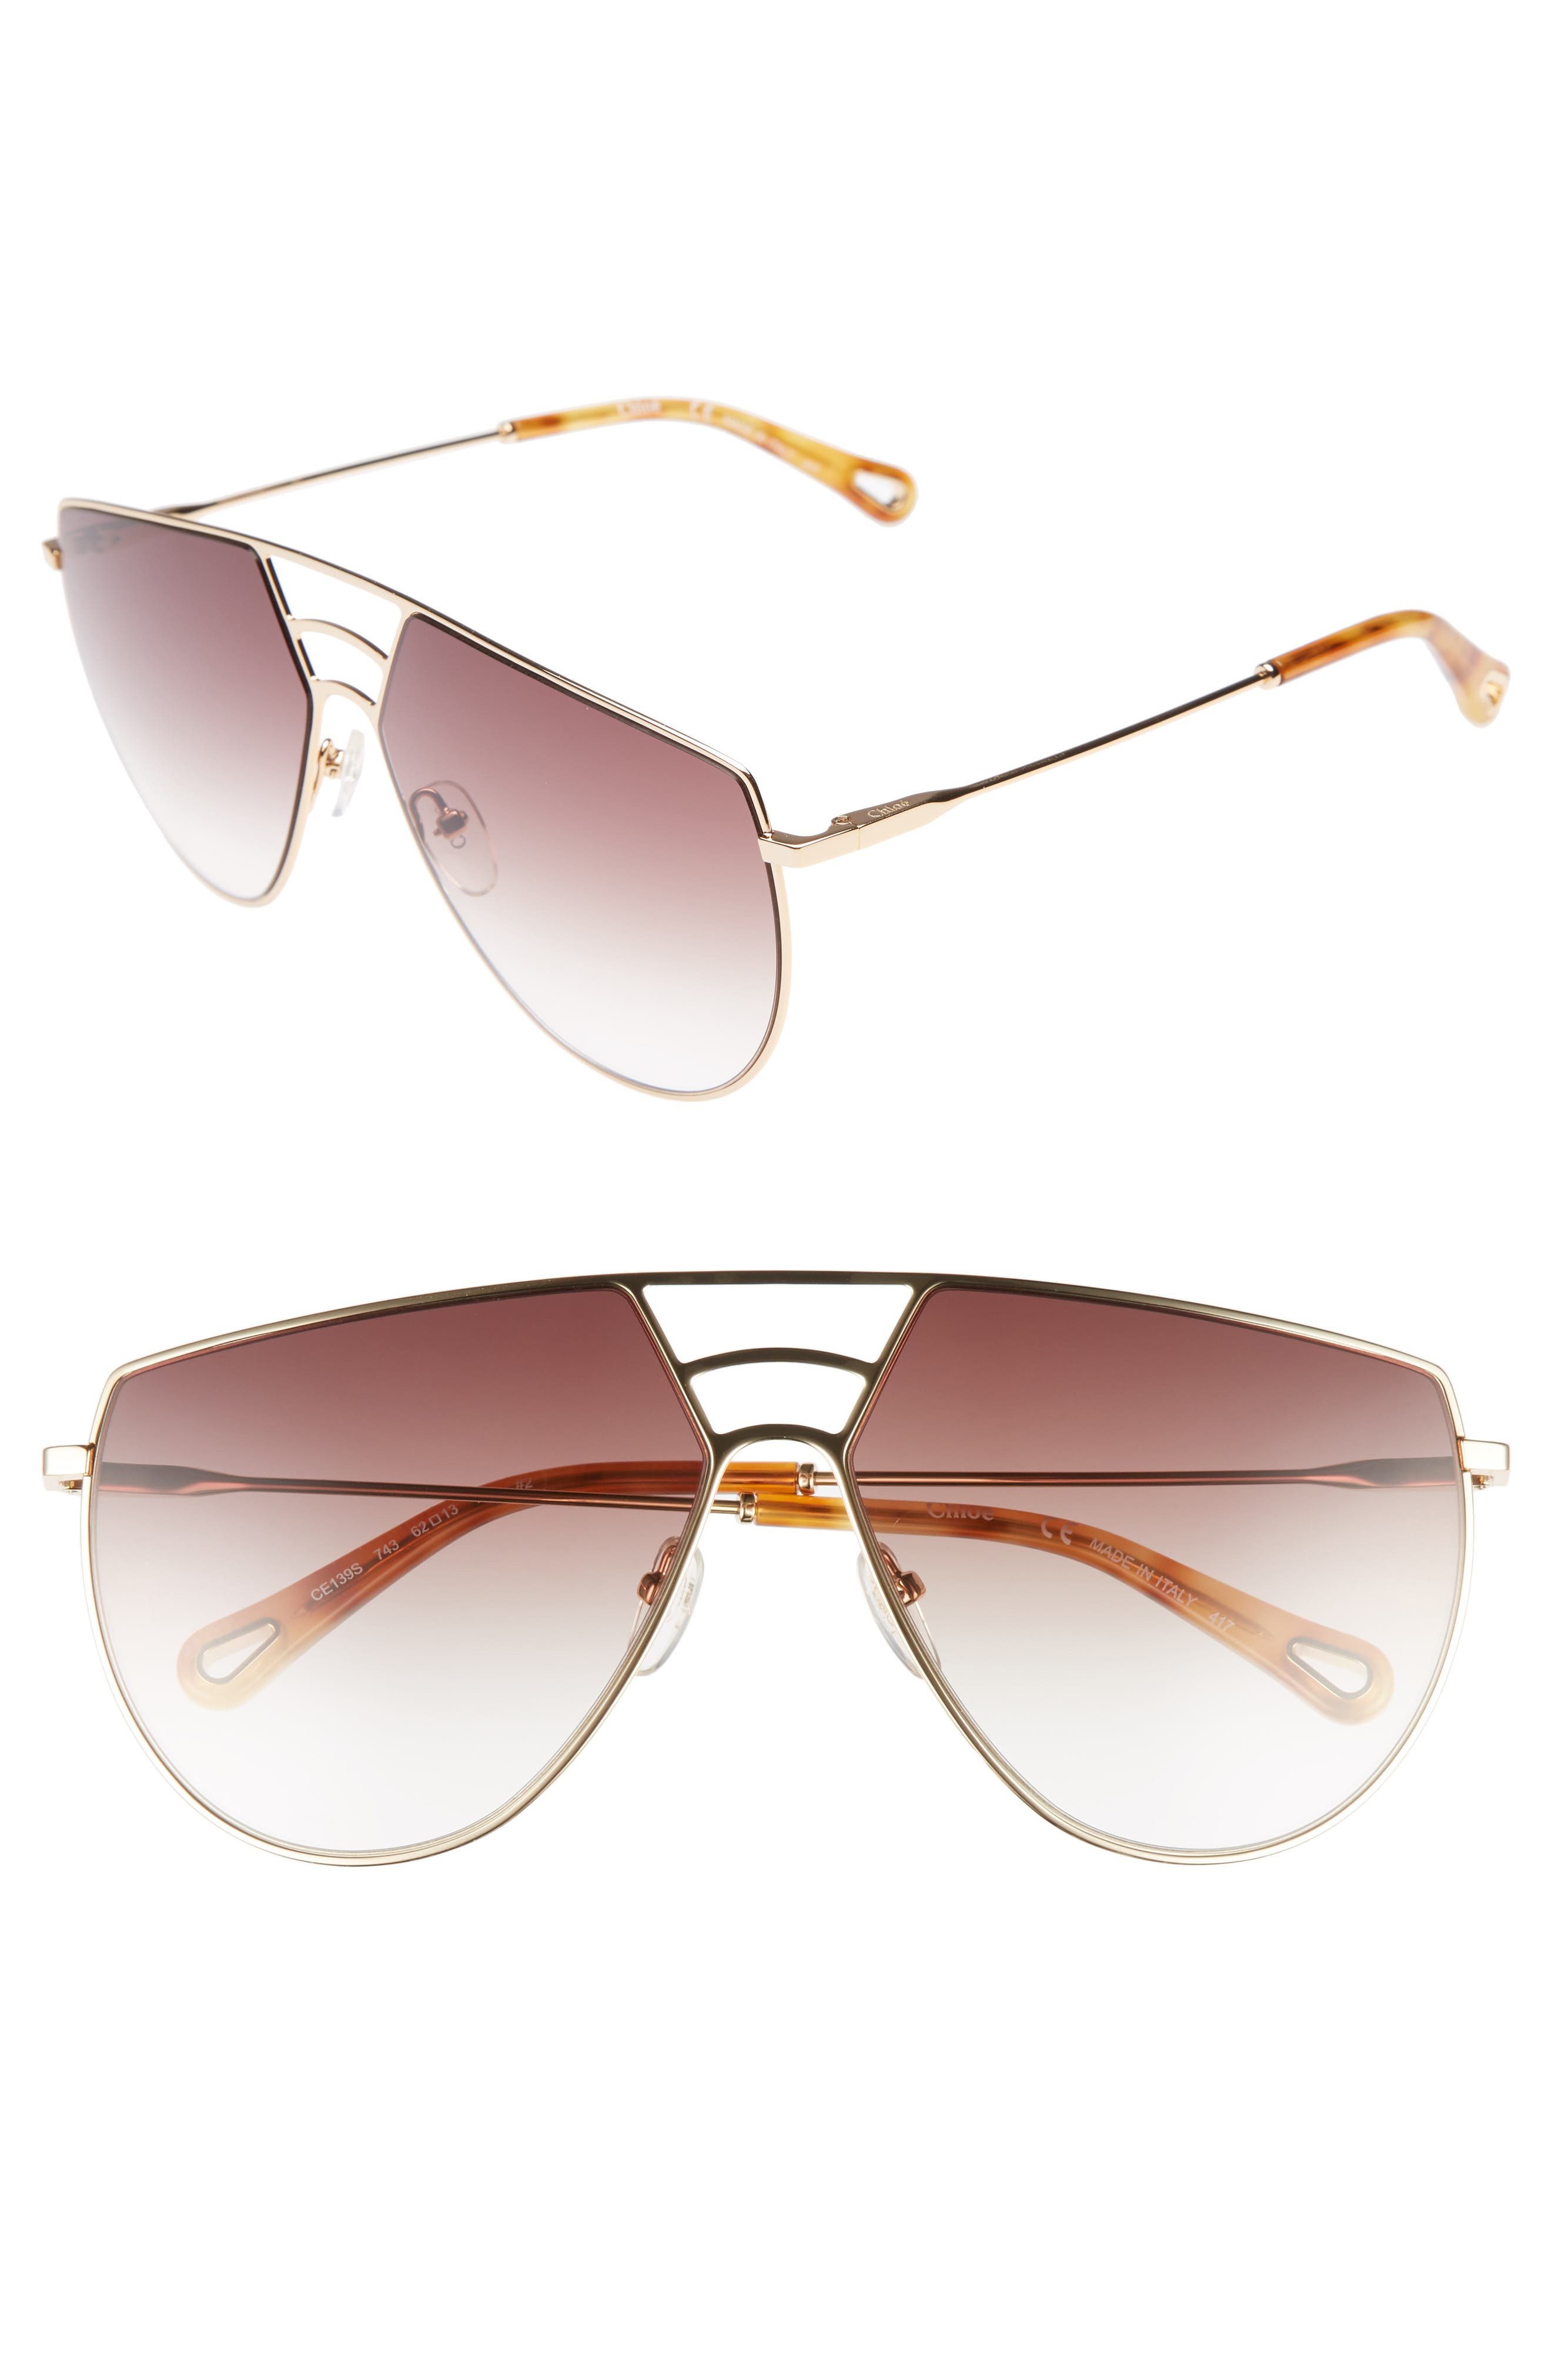 Negative Space 62mm Oversize Aviator Sunglasses,                             Main thumbnail 1, color,                             710